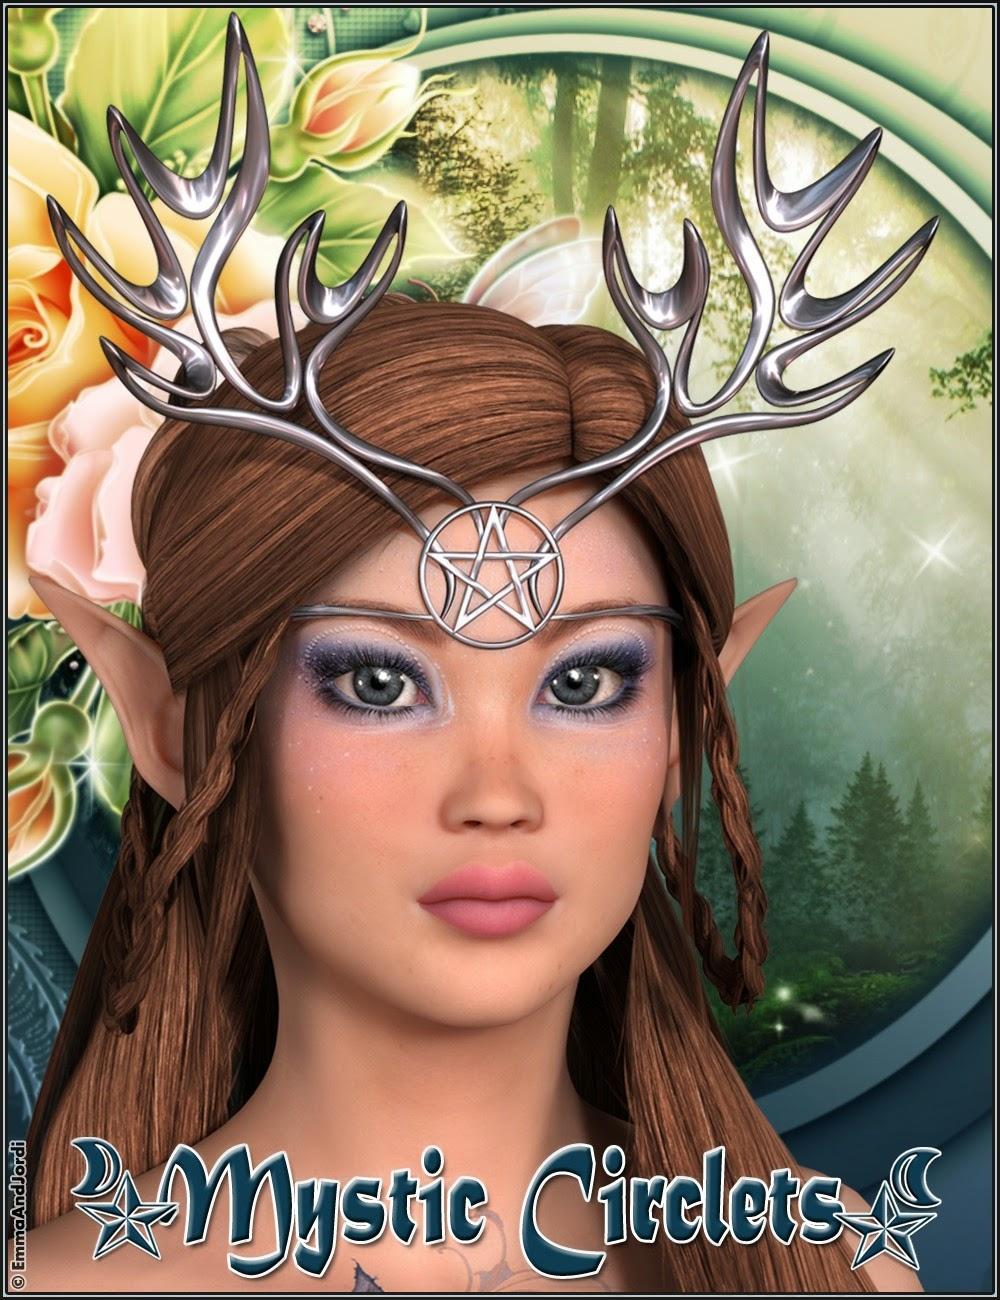 3d Models - Mystic Circlets For Any Figure